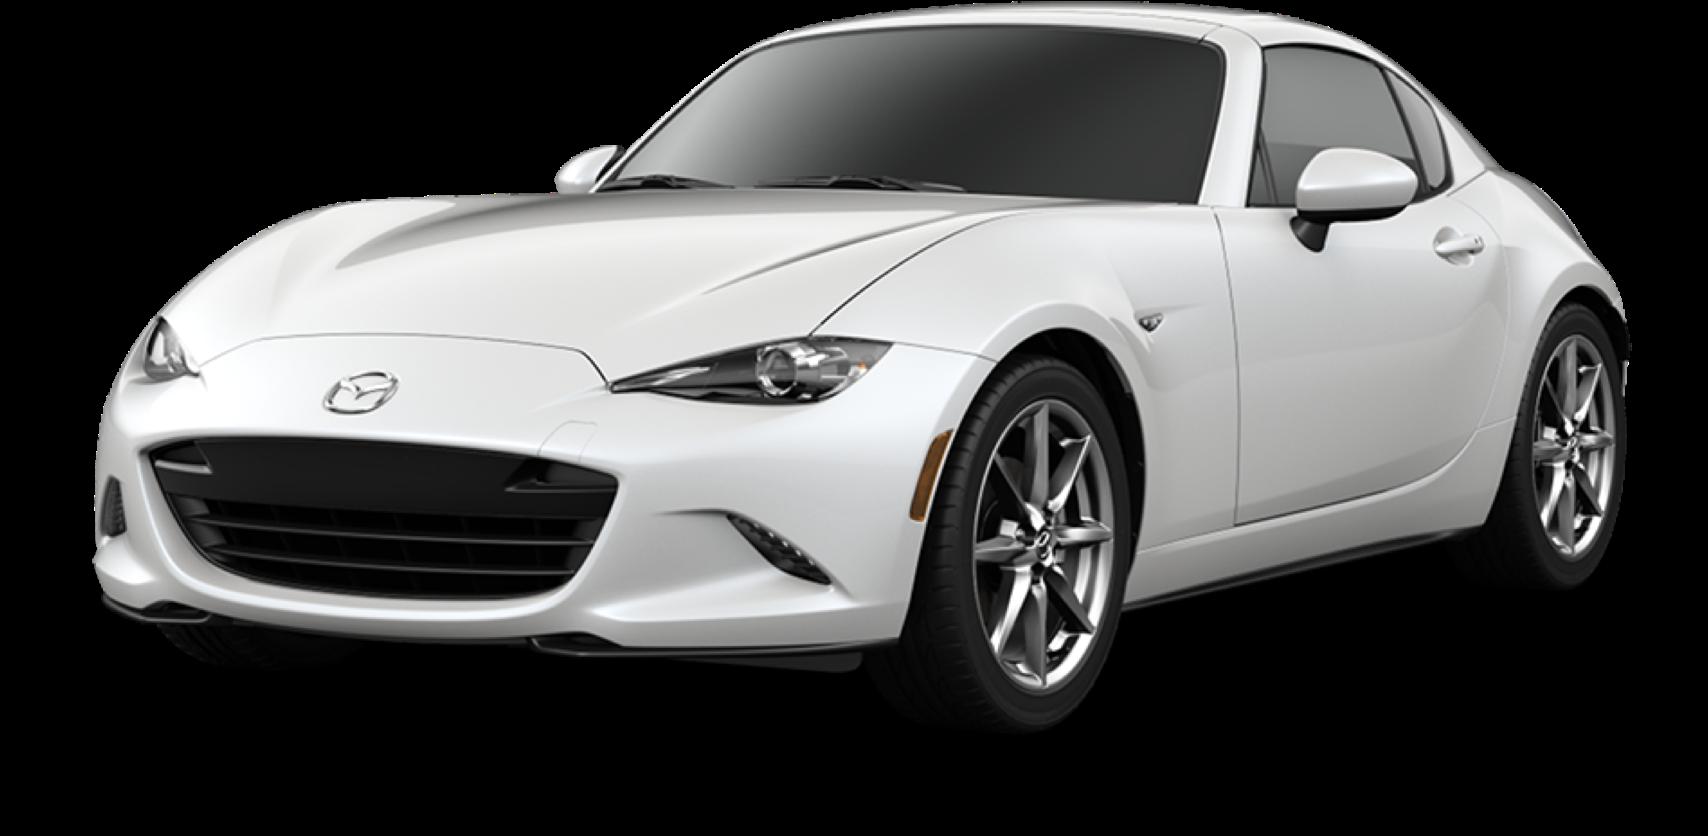 2021 Mazda MX-5 Miata RF, Snowflake White Pearl Mica